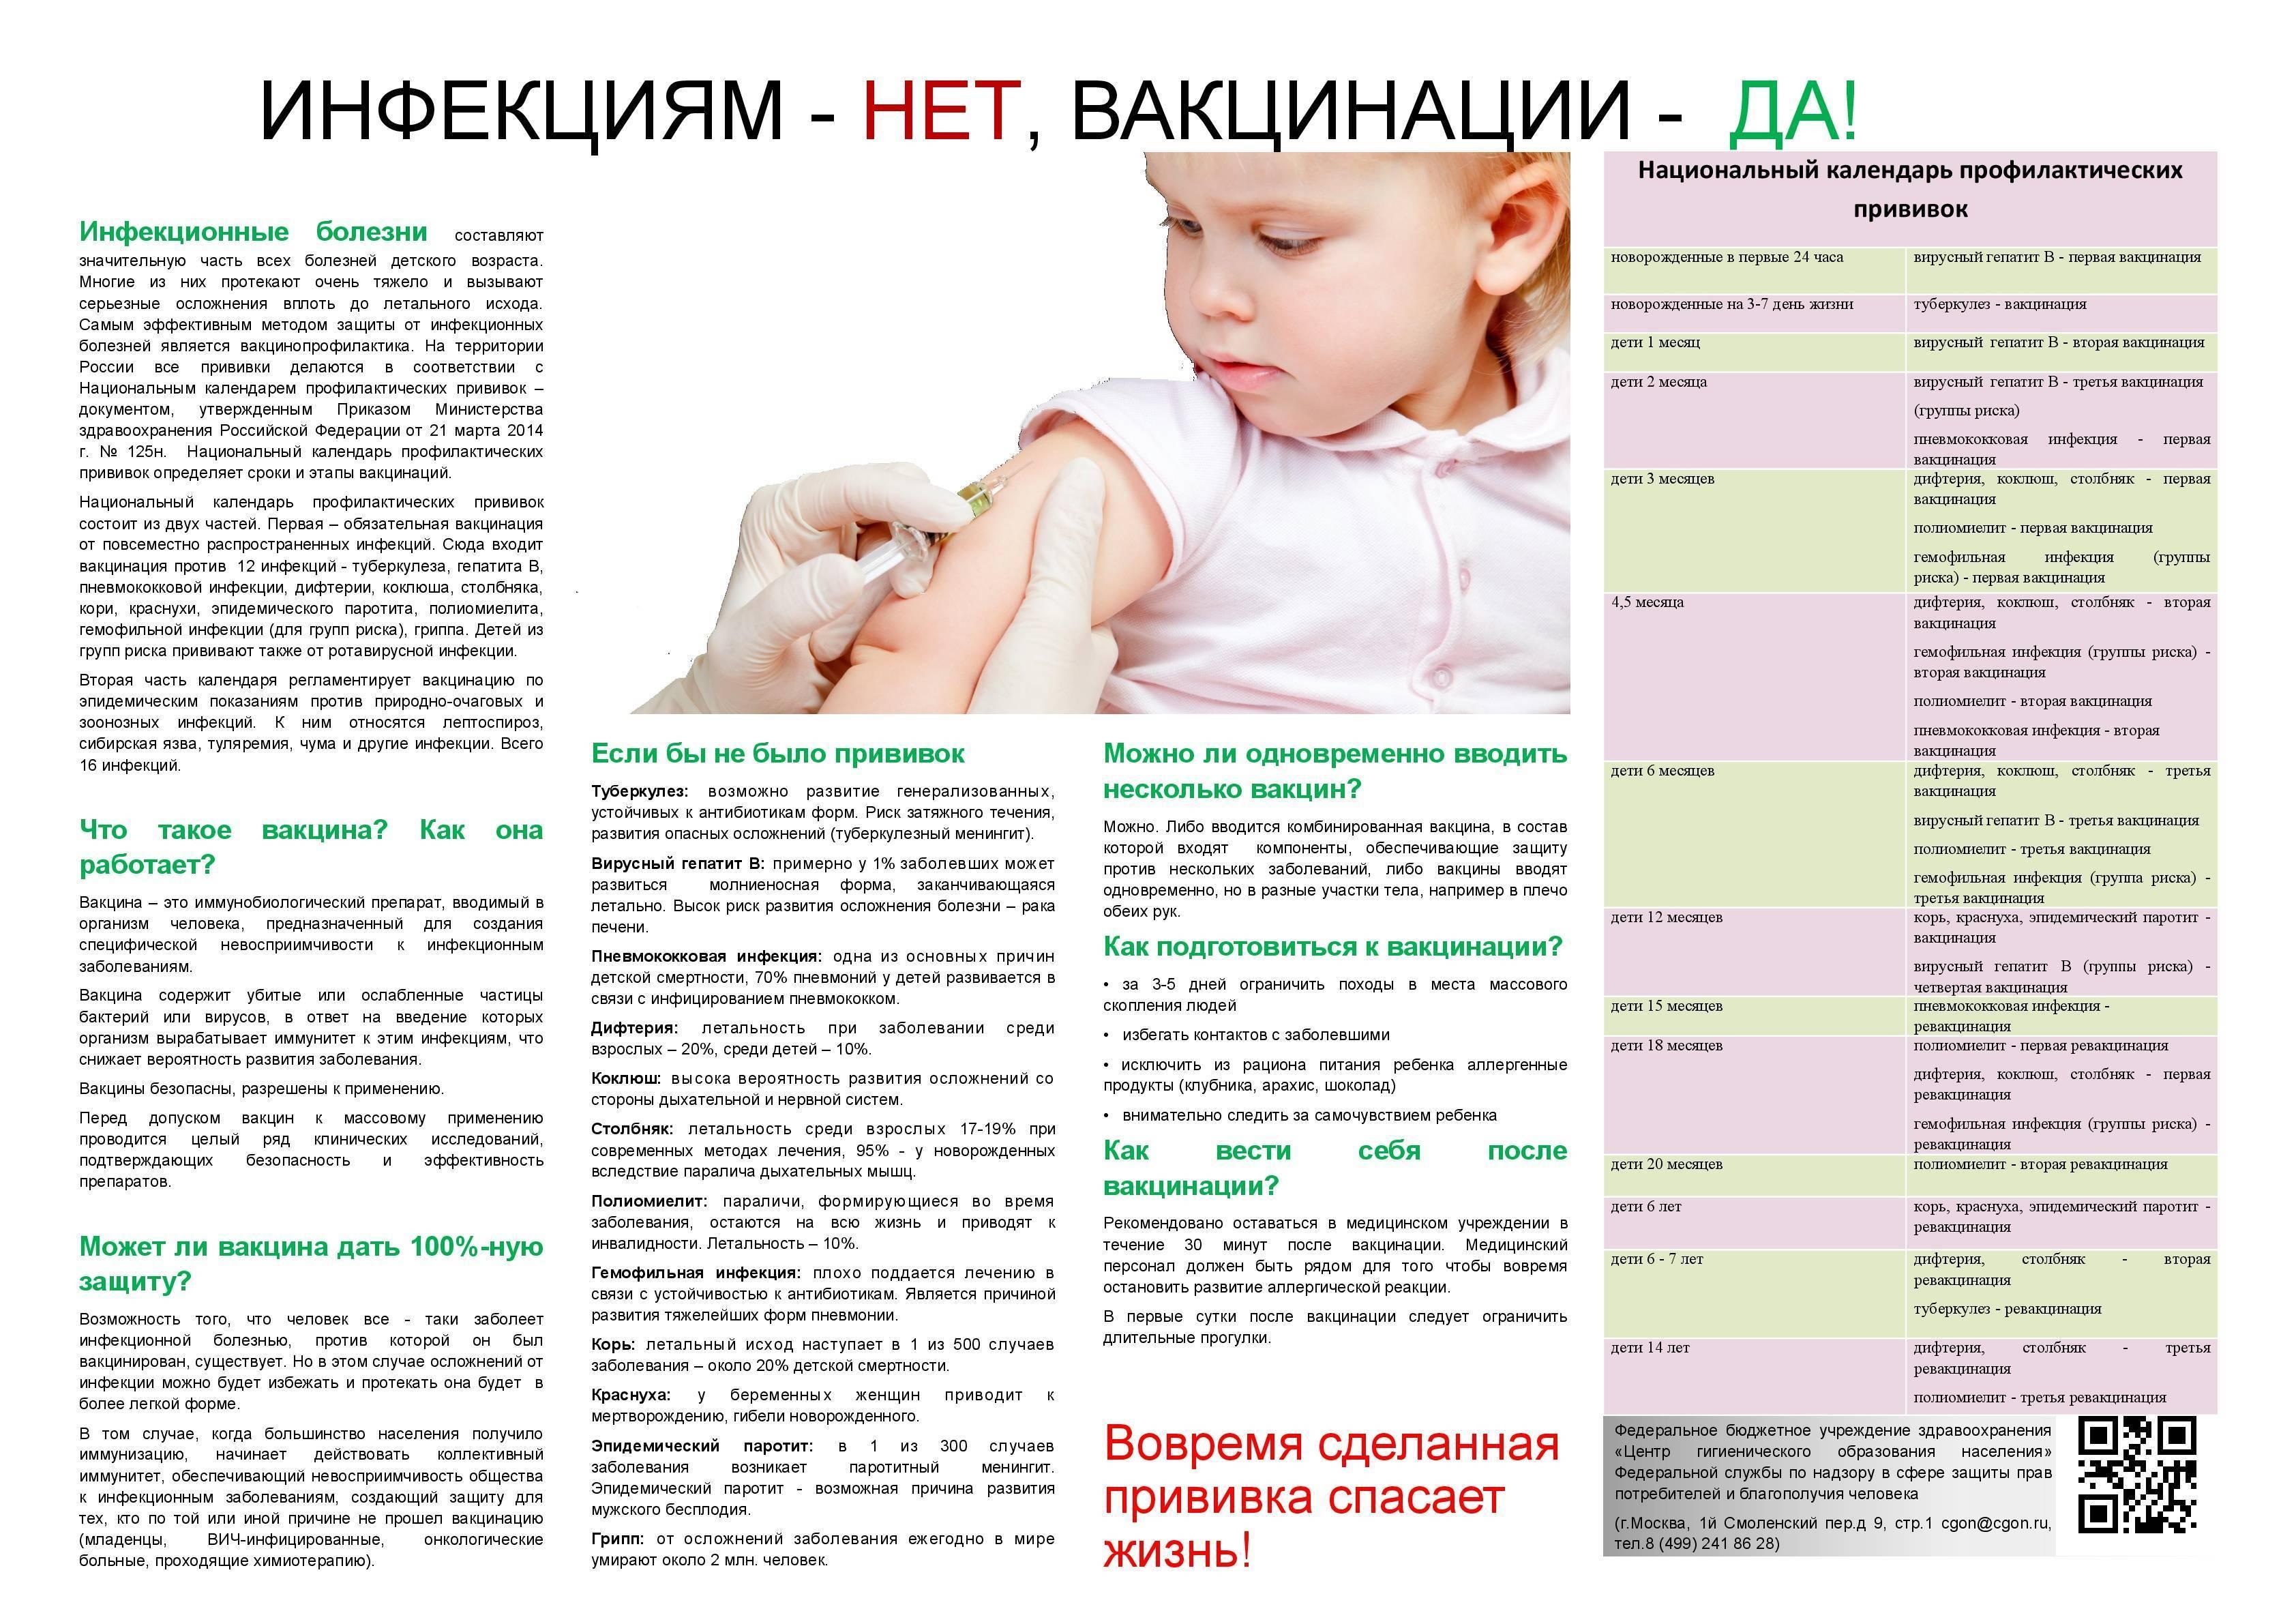 Реакция на прививку от гепатита - типы осложнений